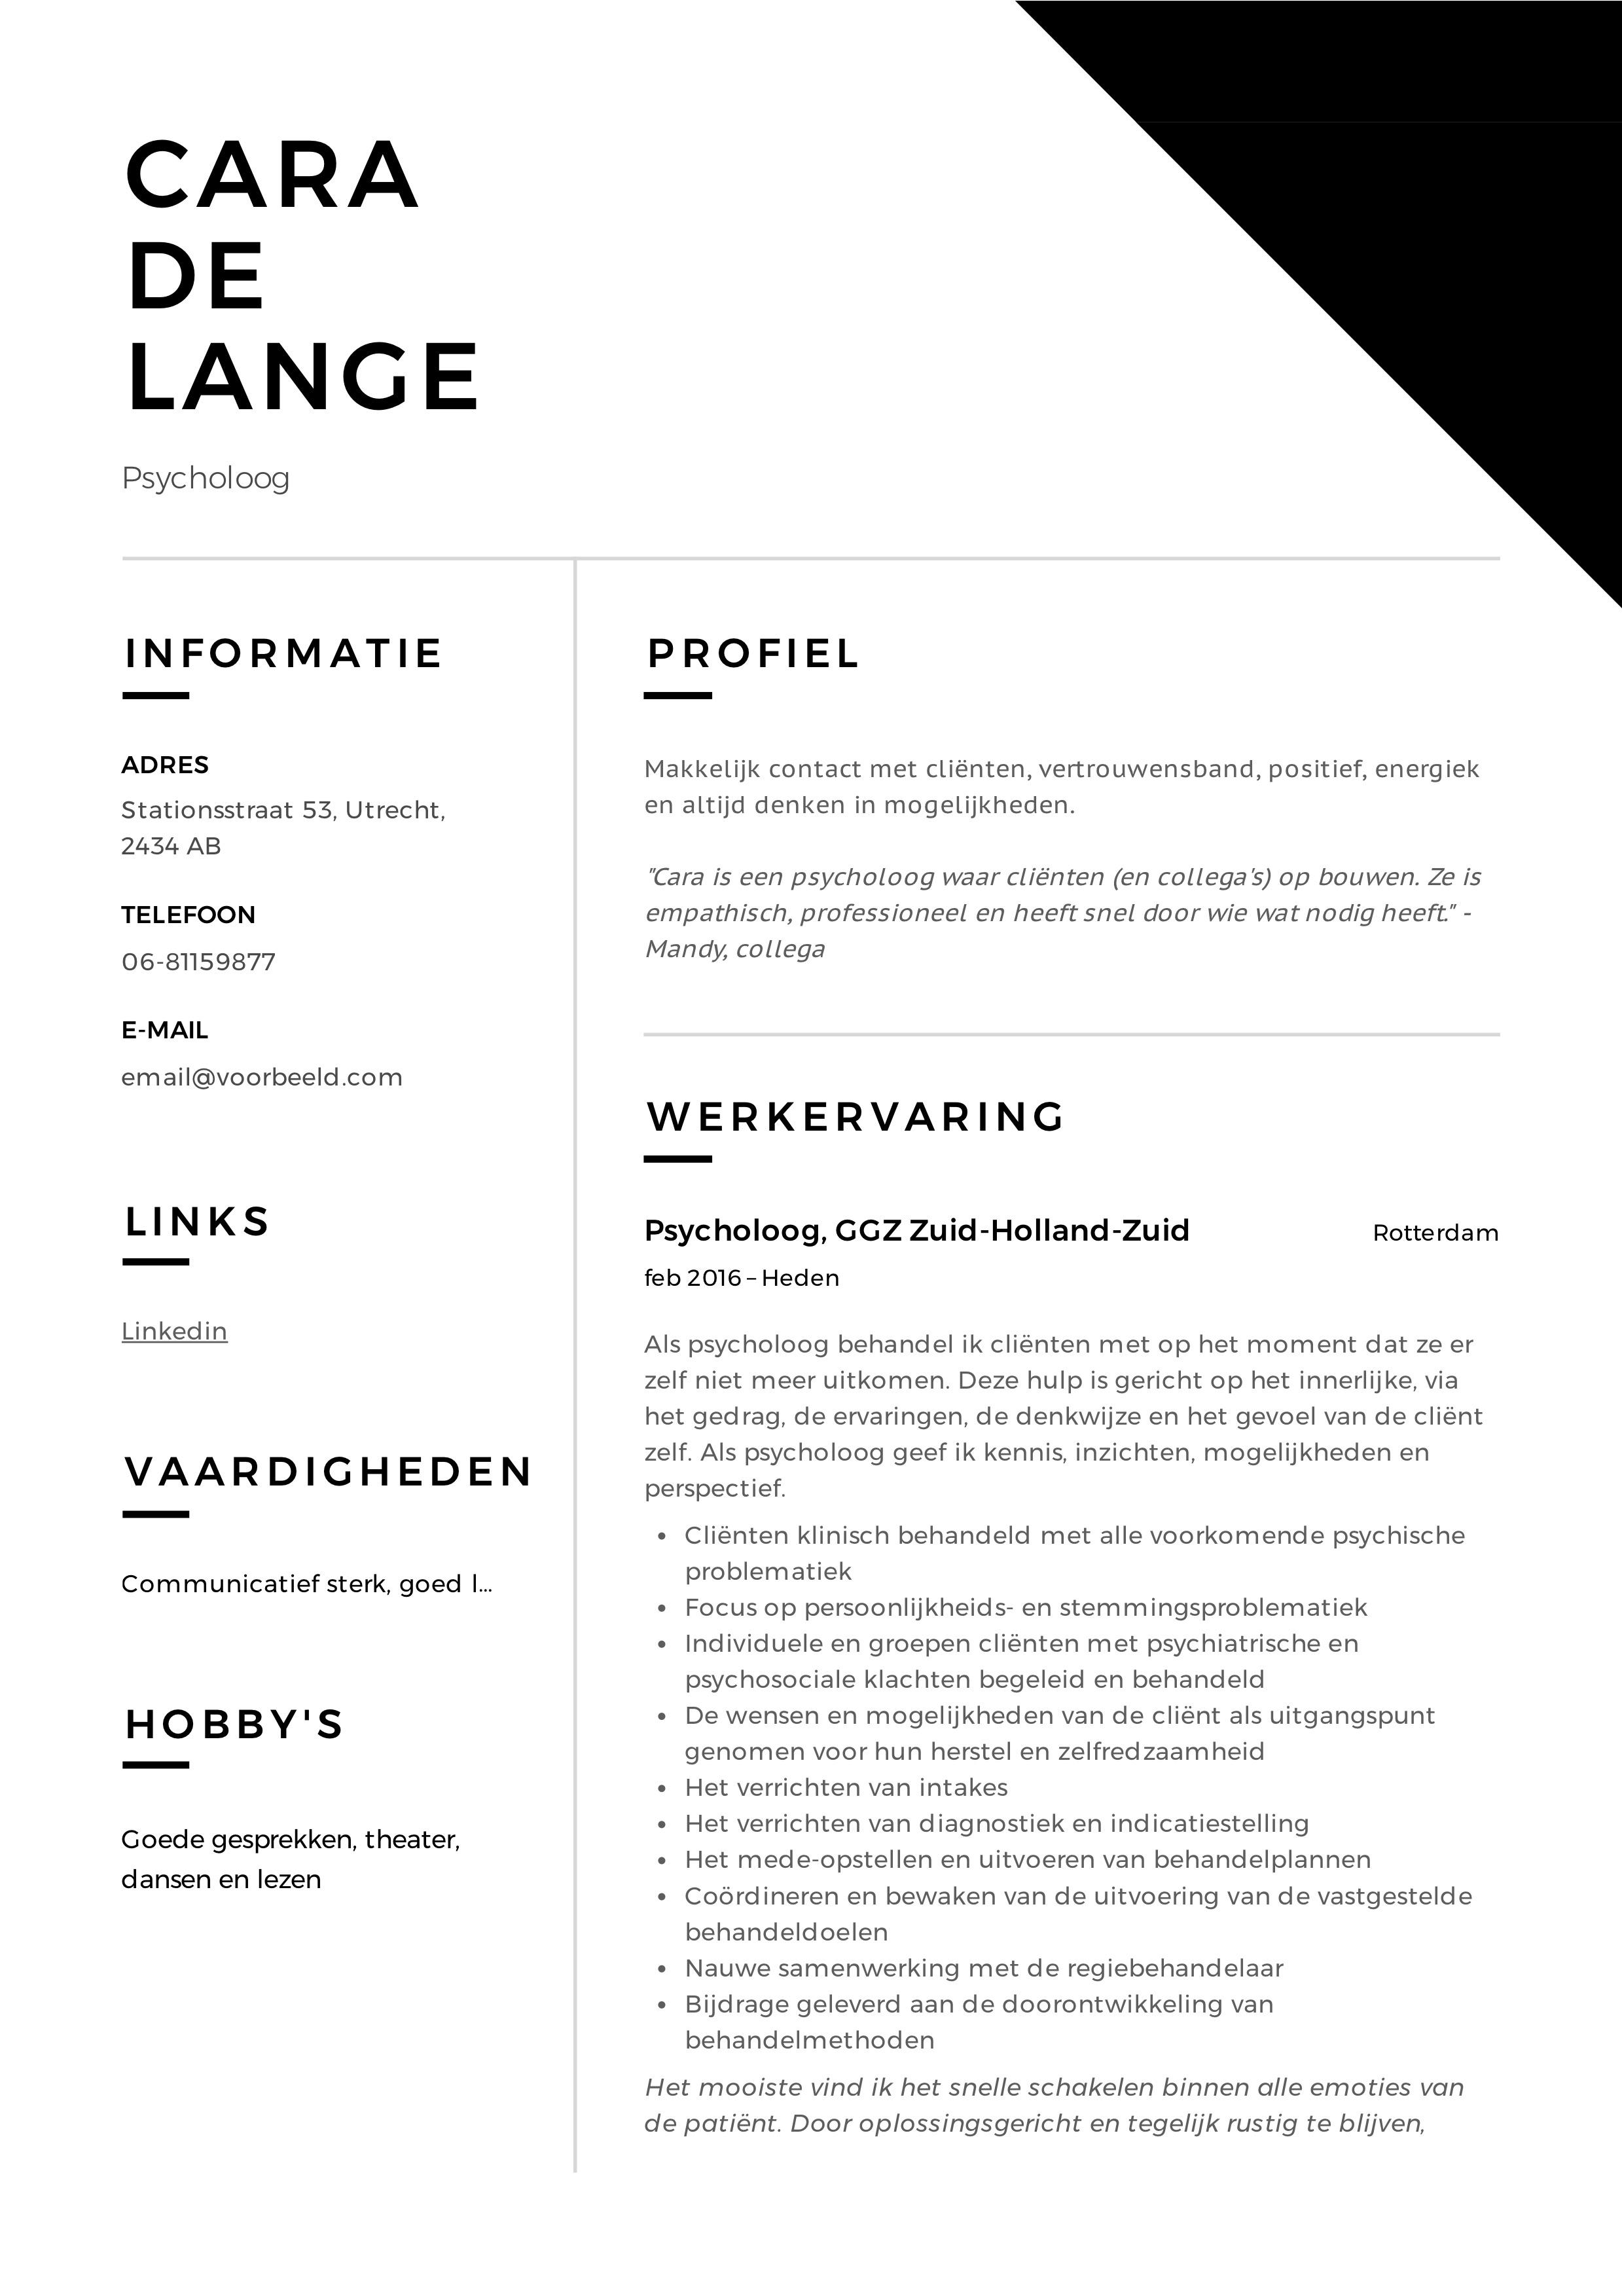 Cara_de_Lange_-_CV_-_Psycholoog (11)